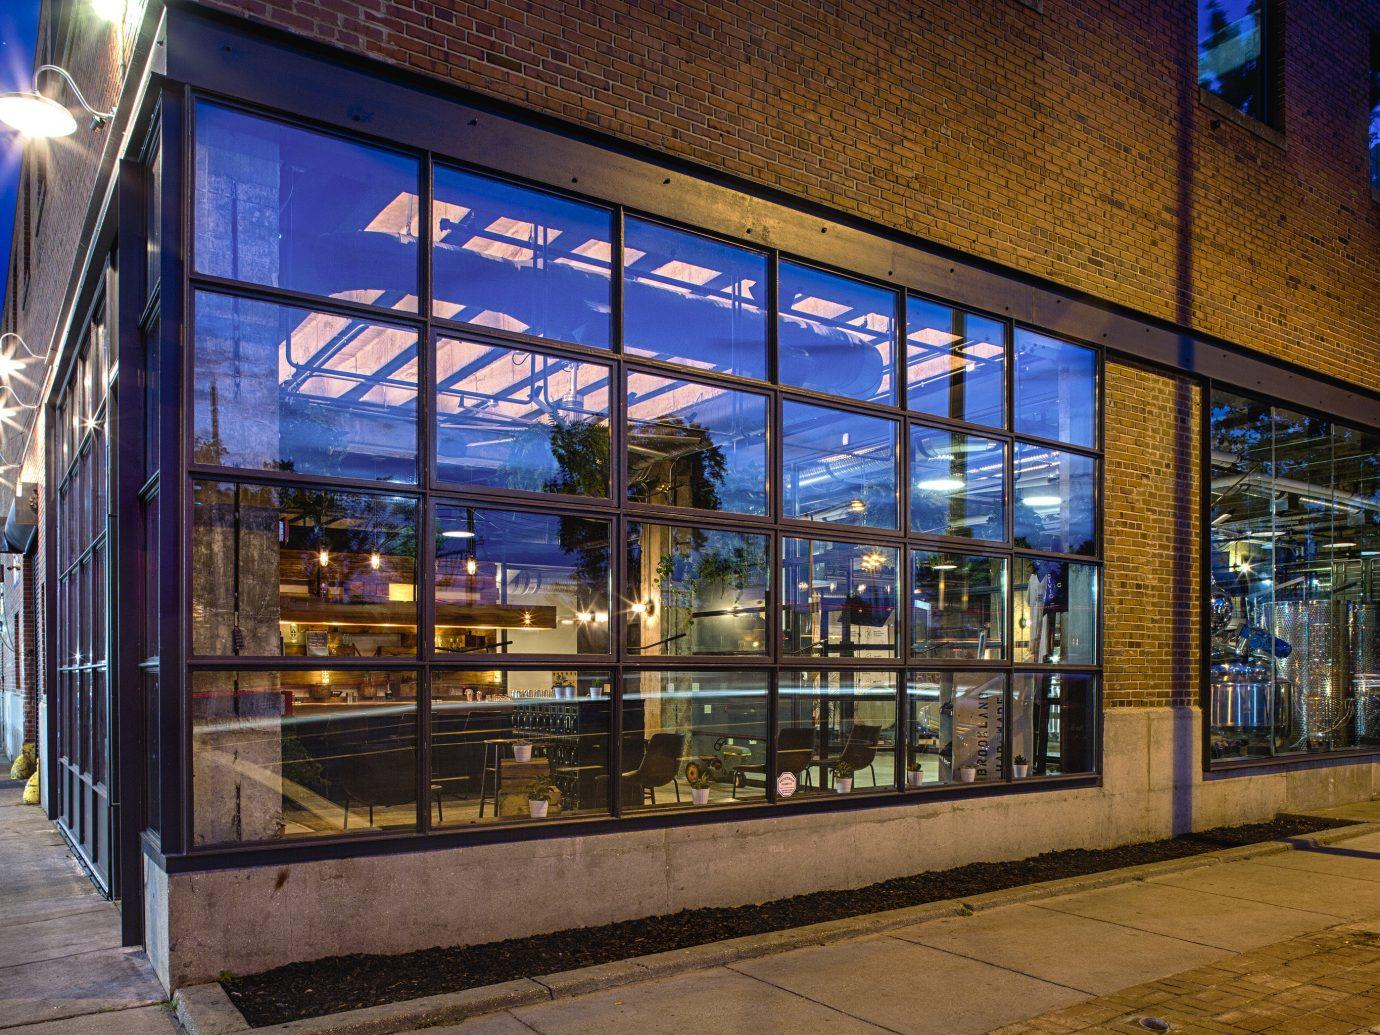 Food + Drink building urban area Architecture window facade store interior design window covering glass subway